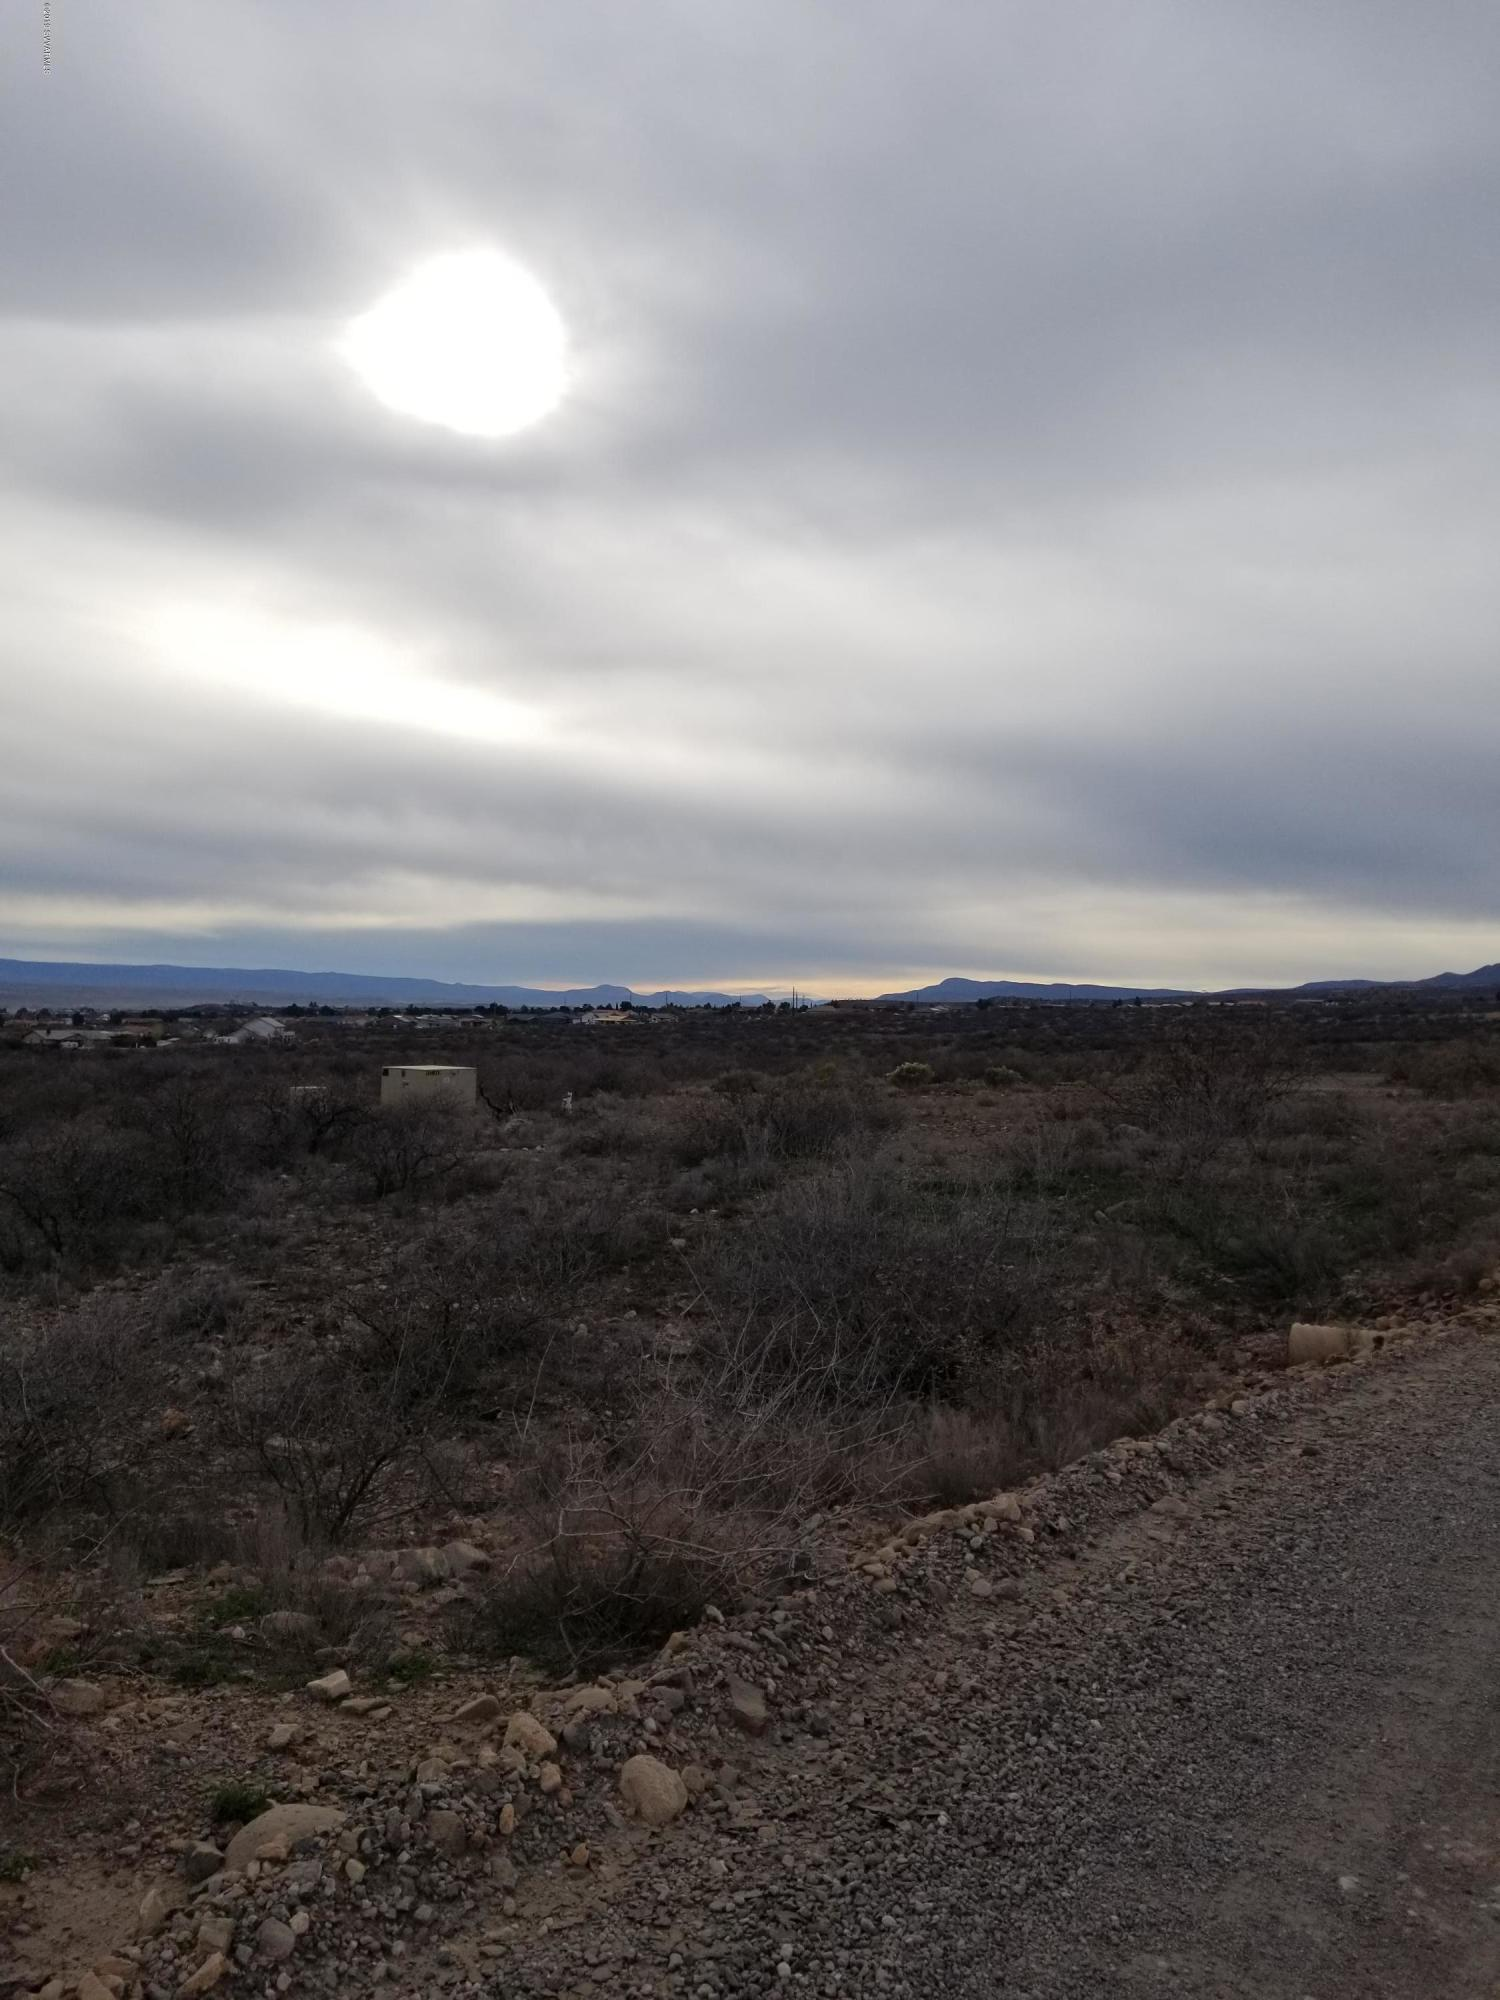 Minerich Clarkdale, AZ 86324